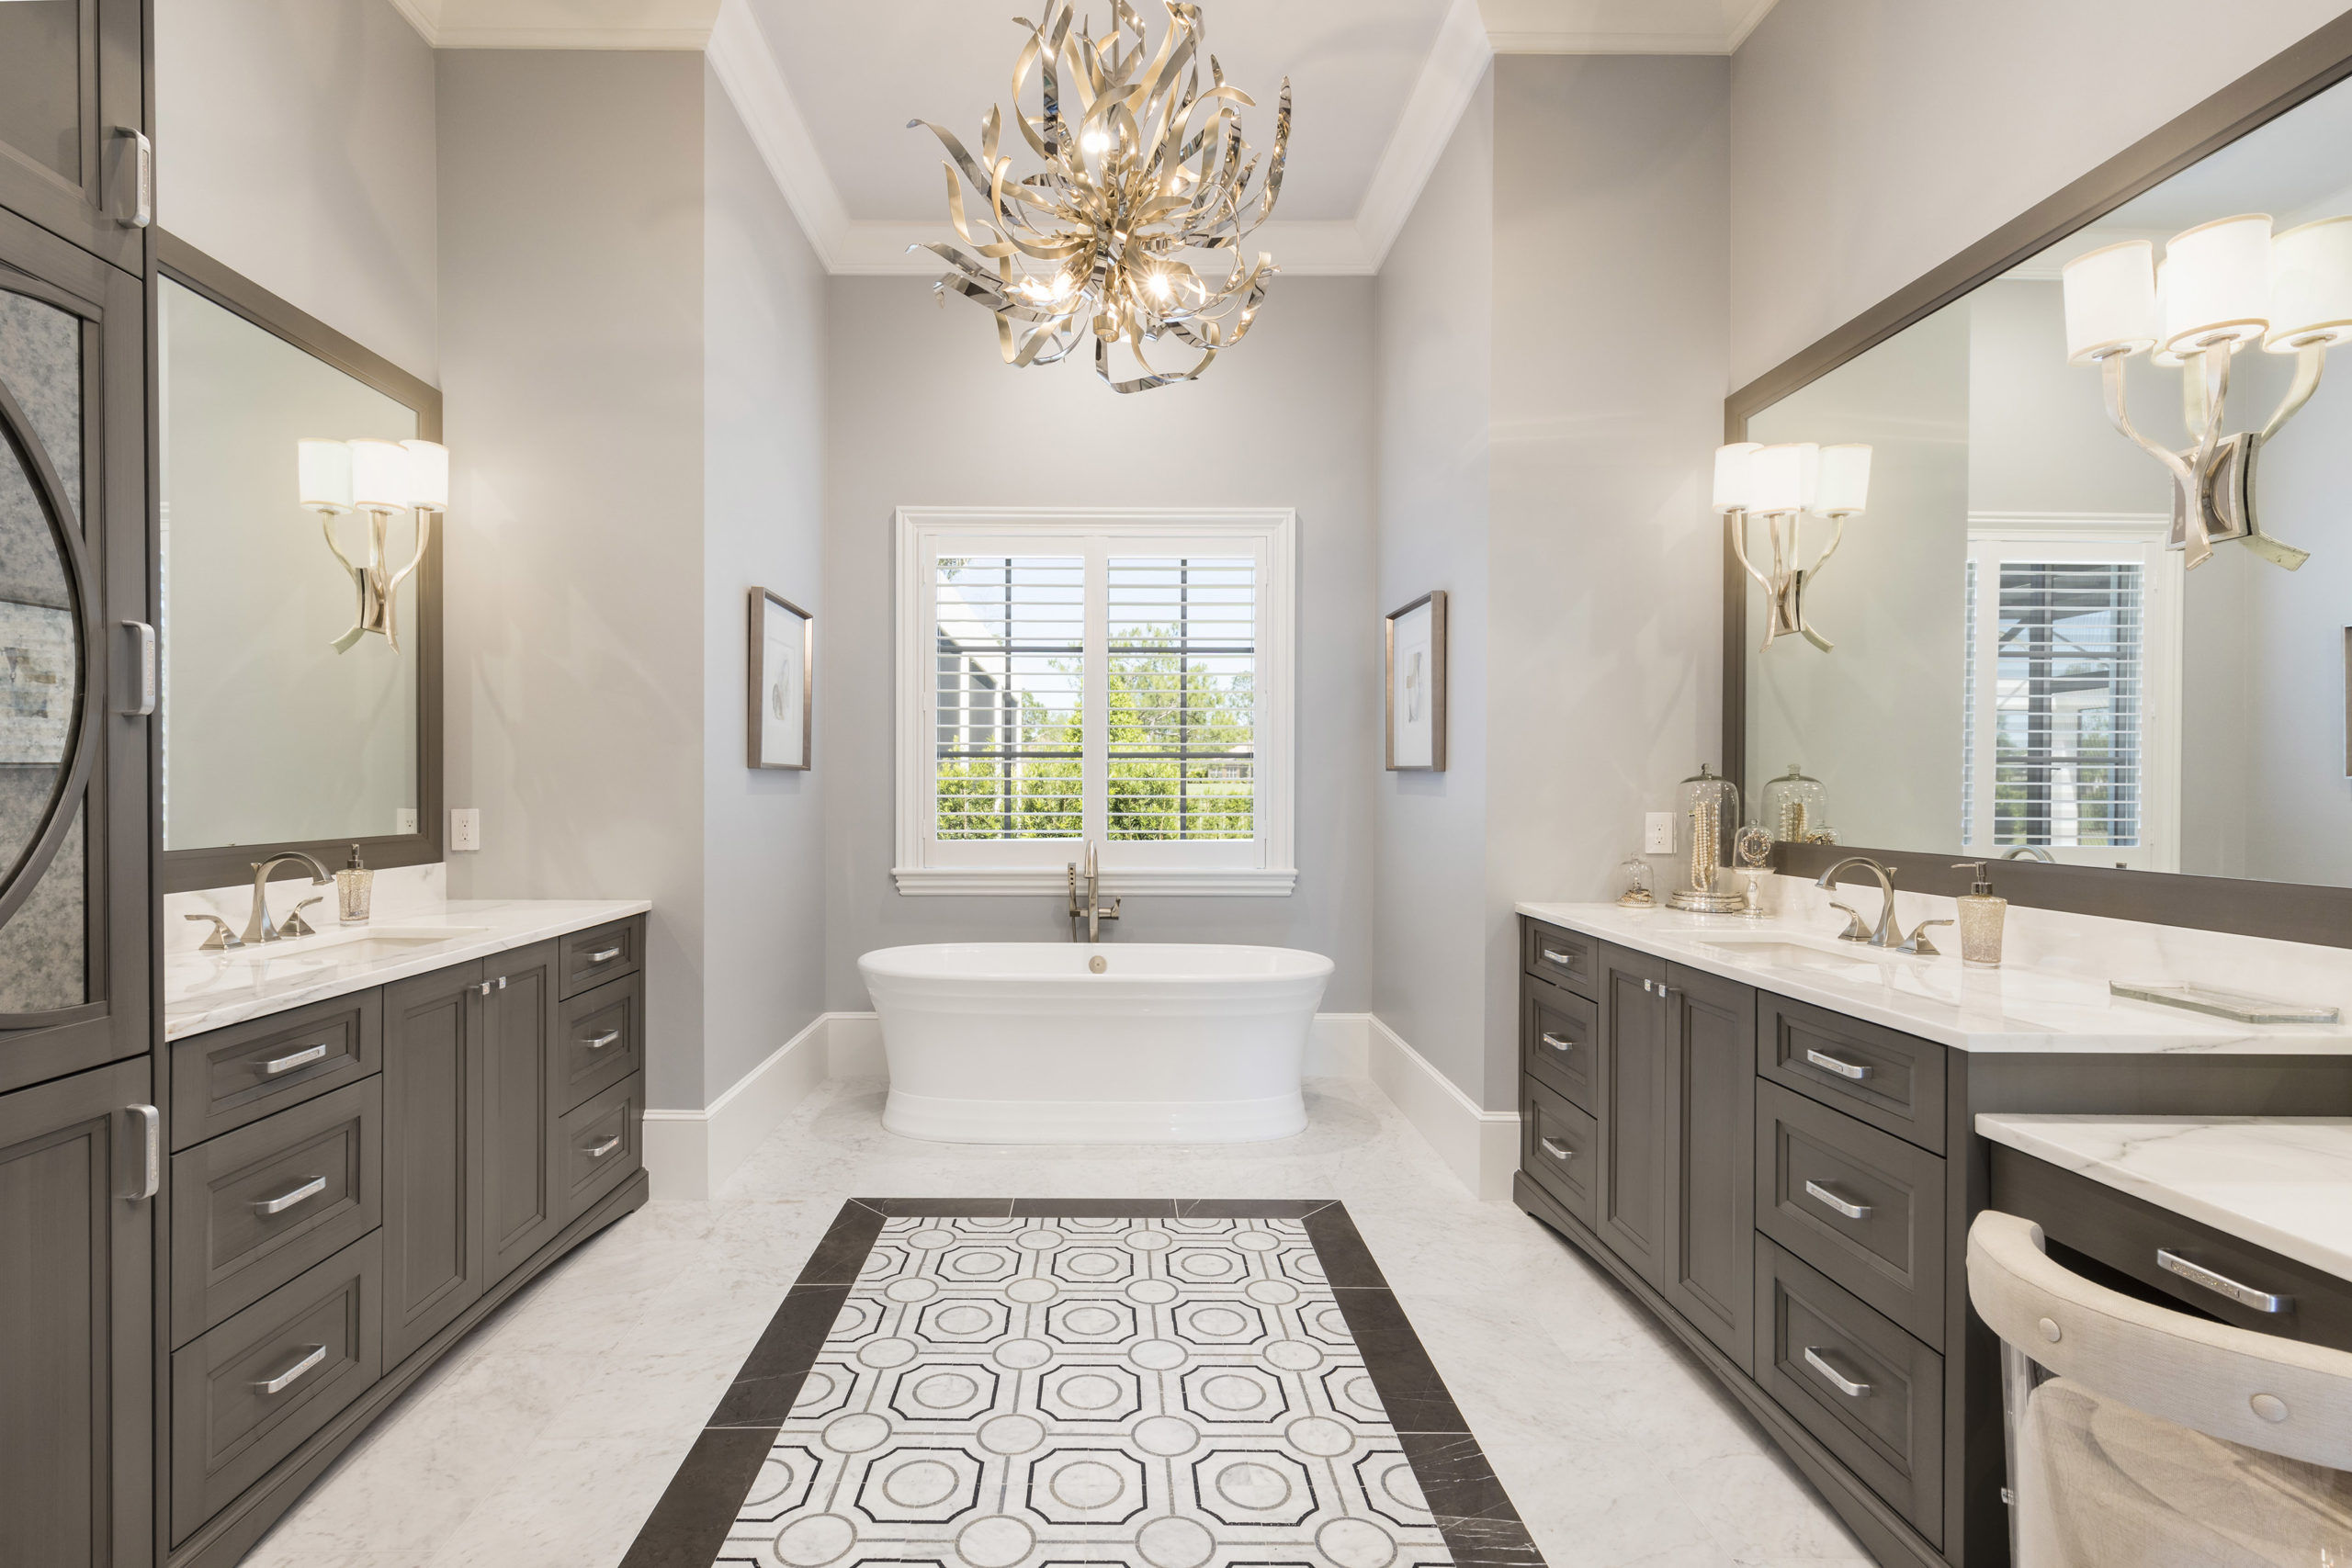 Master bedroom leading into master bathroom with separate bathtub